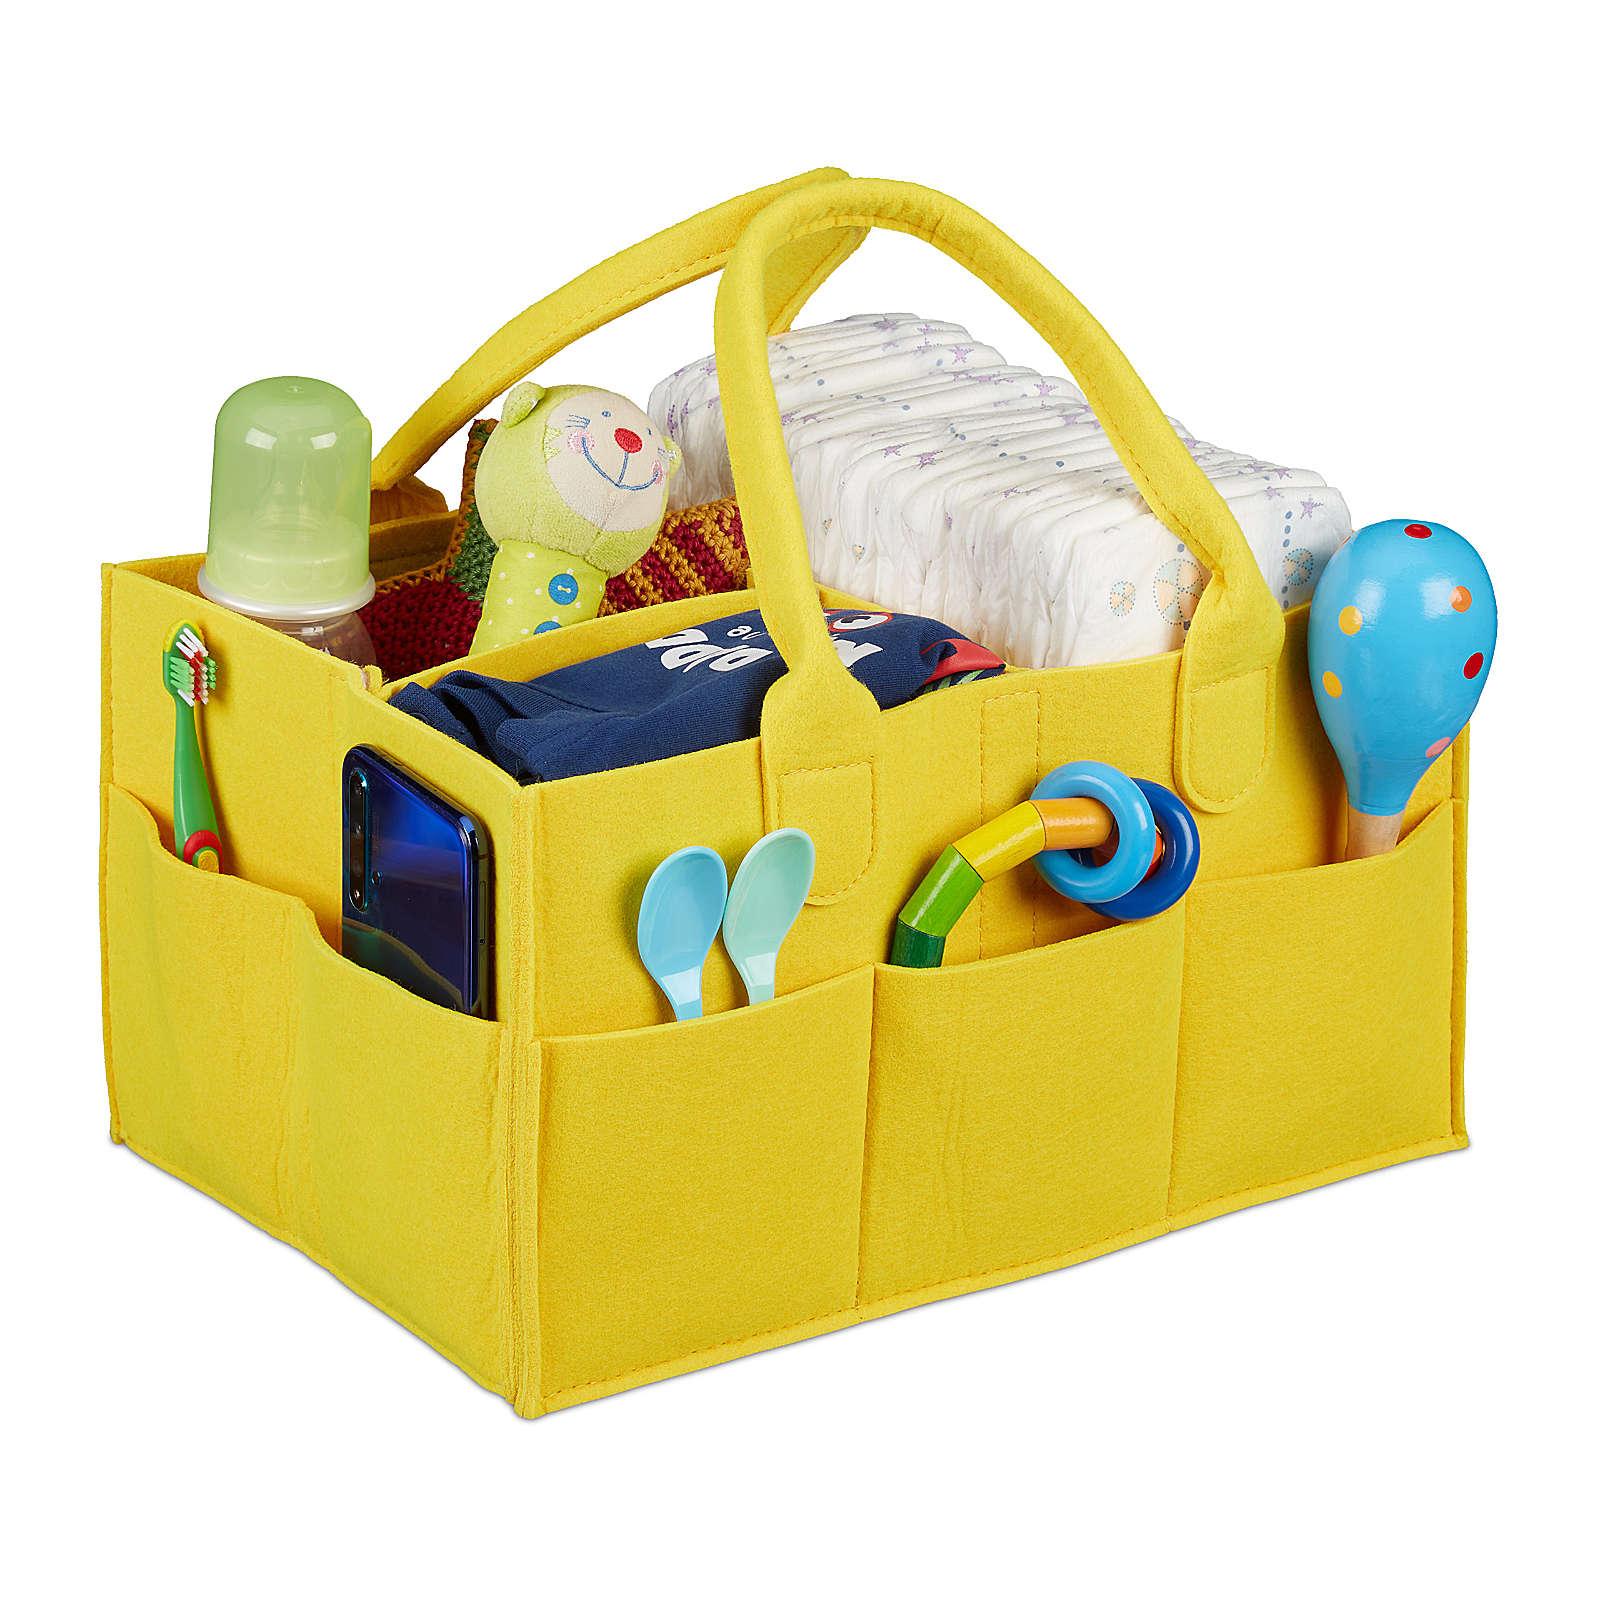 relaxdays Baby Windel Caddy bunt gelb